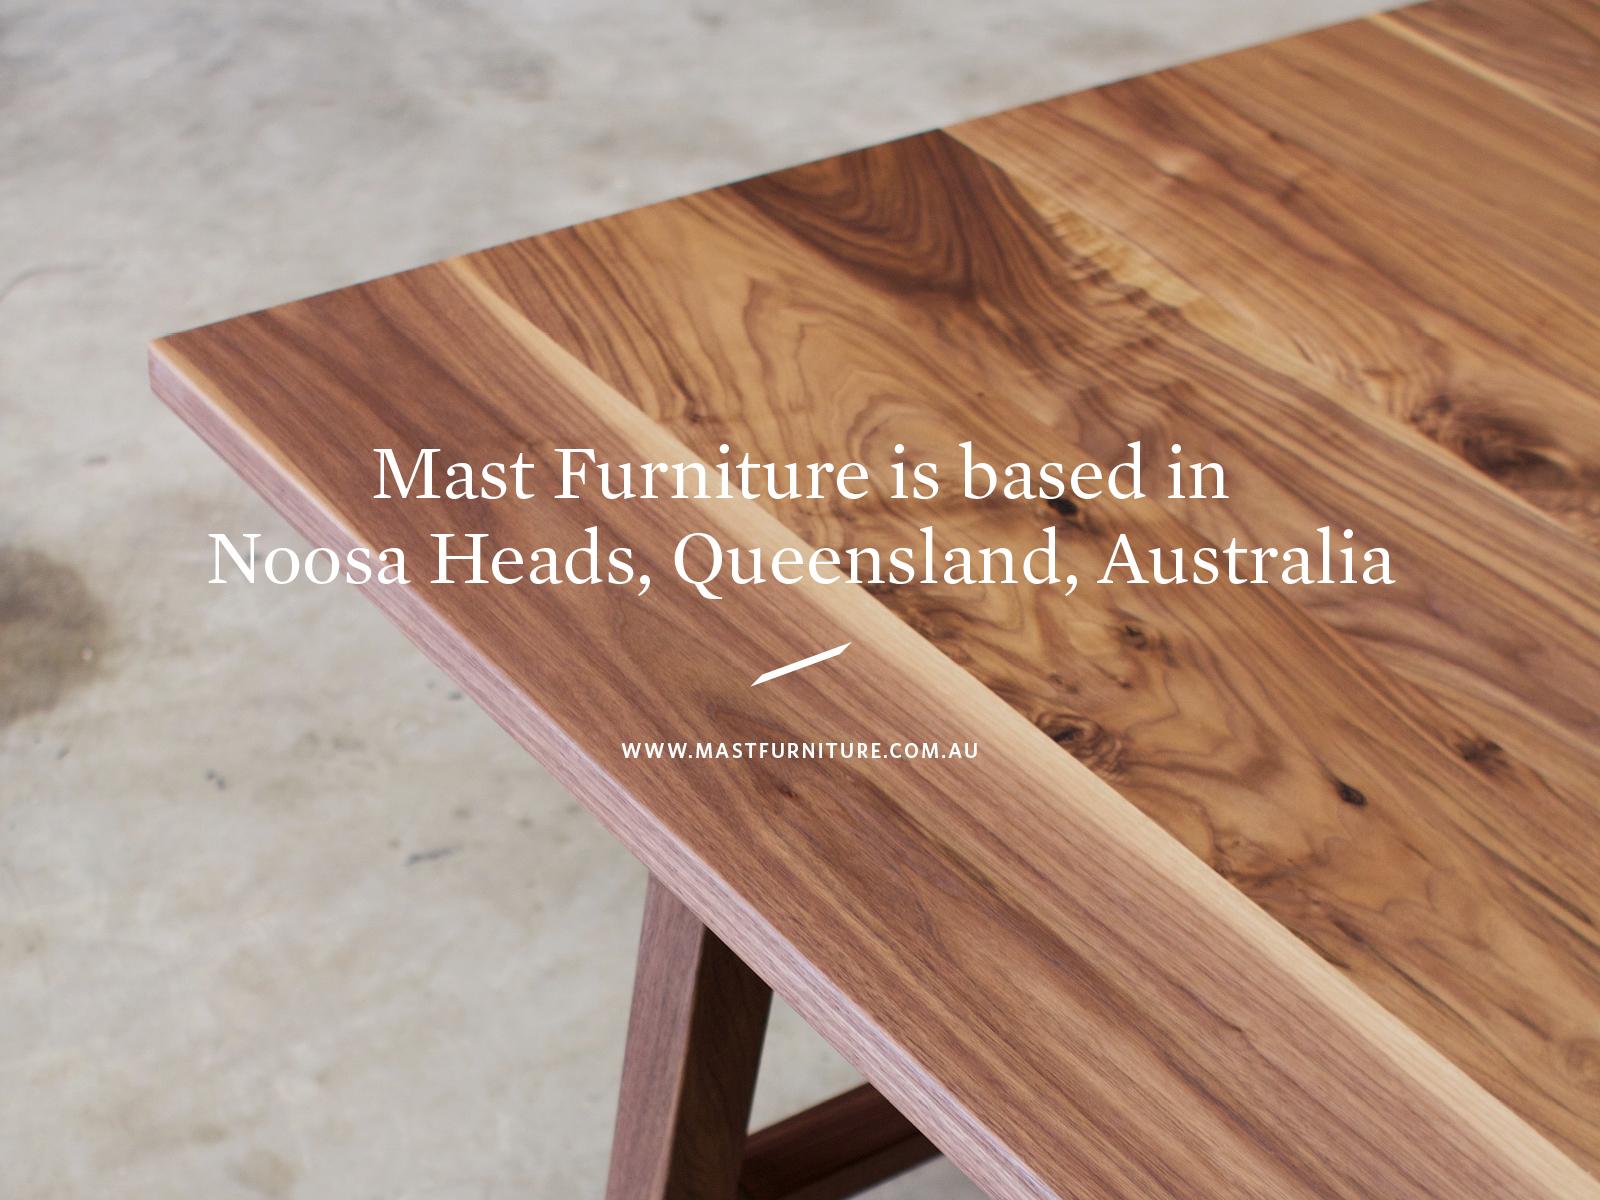 mast-furniture-7.jpg